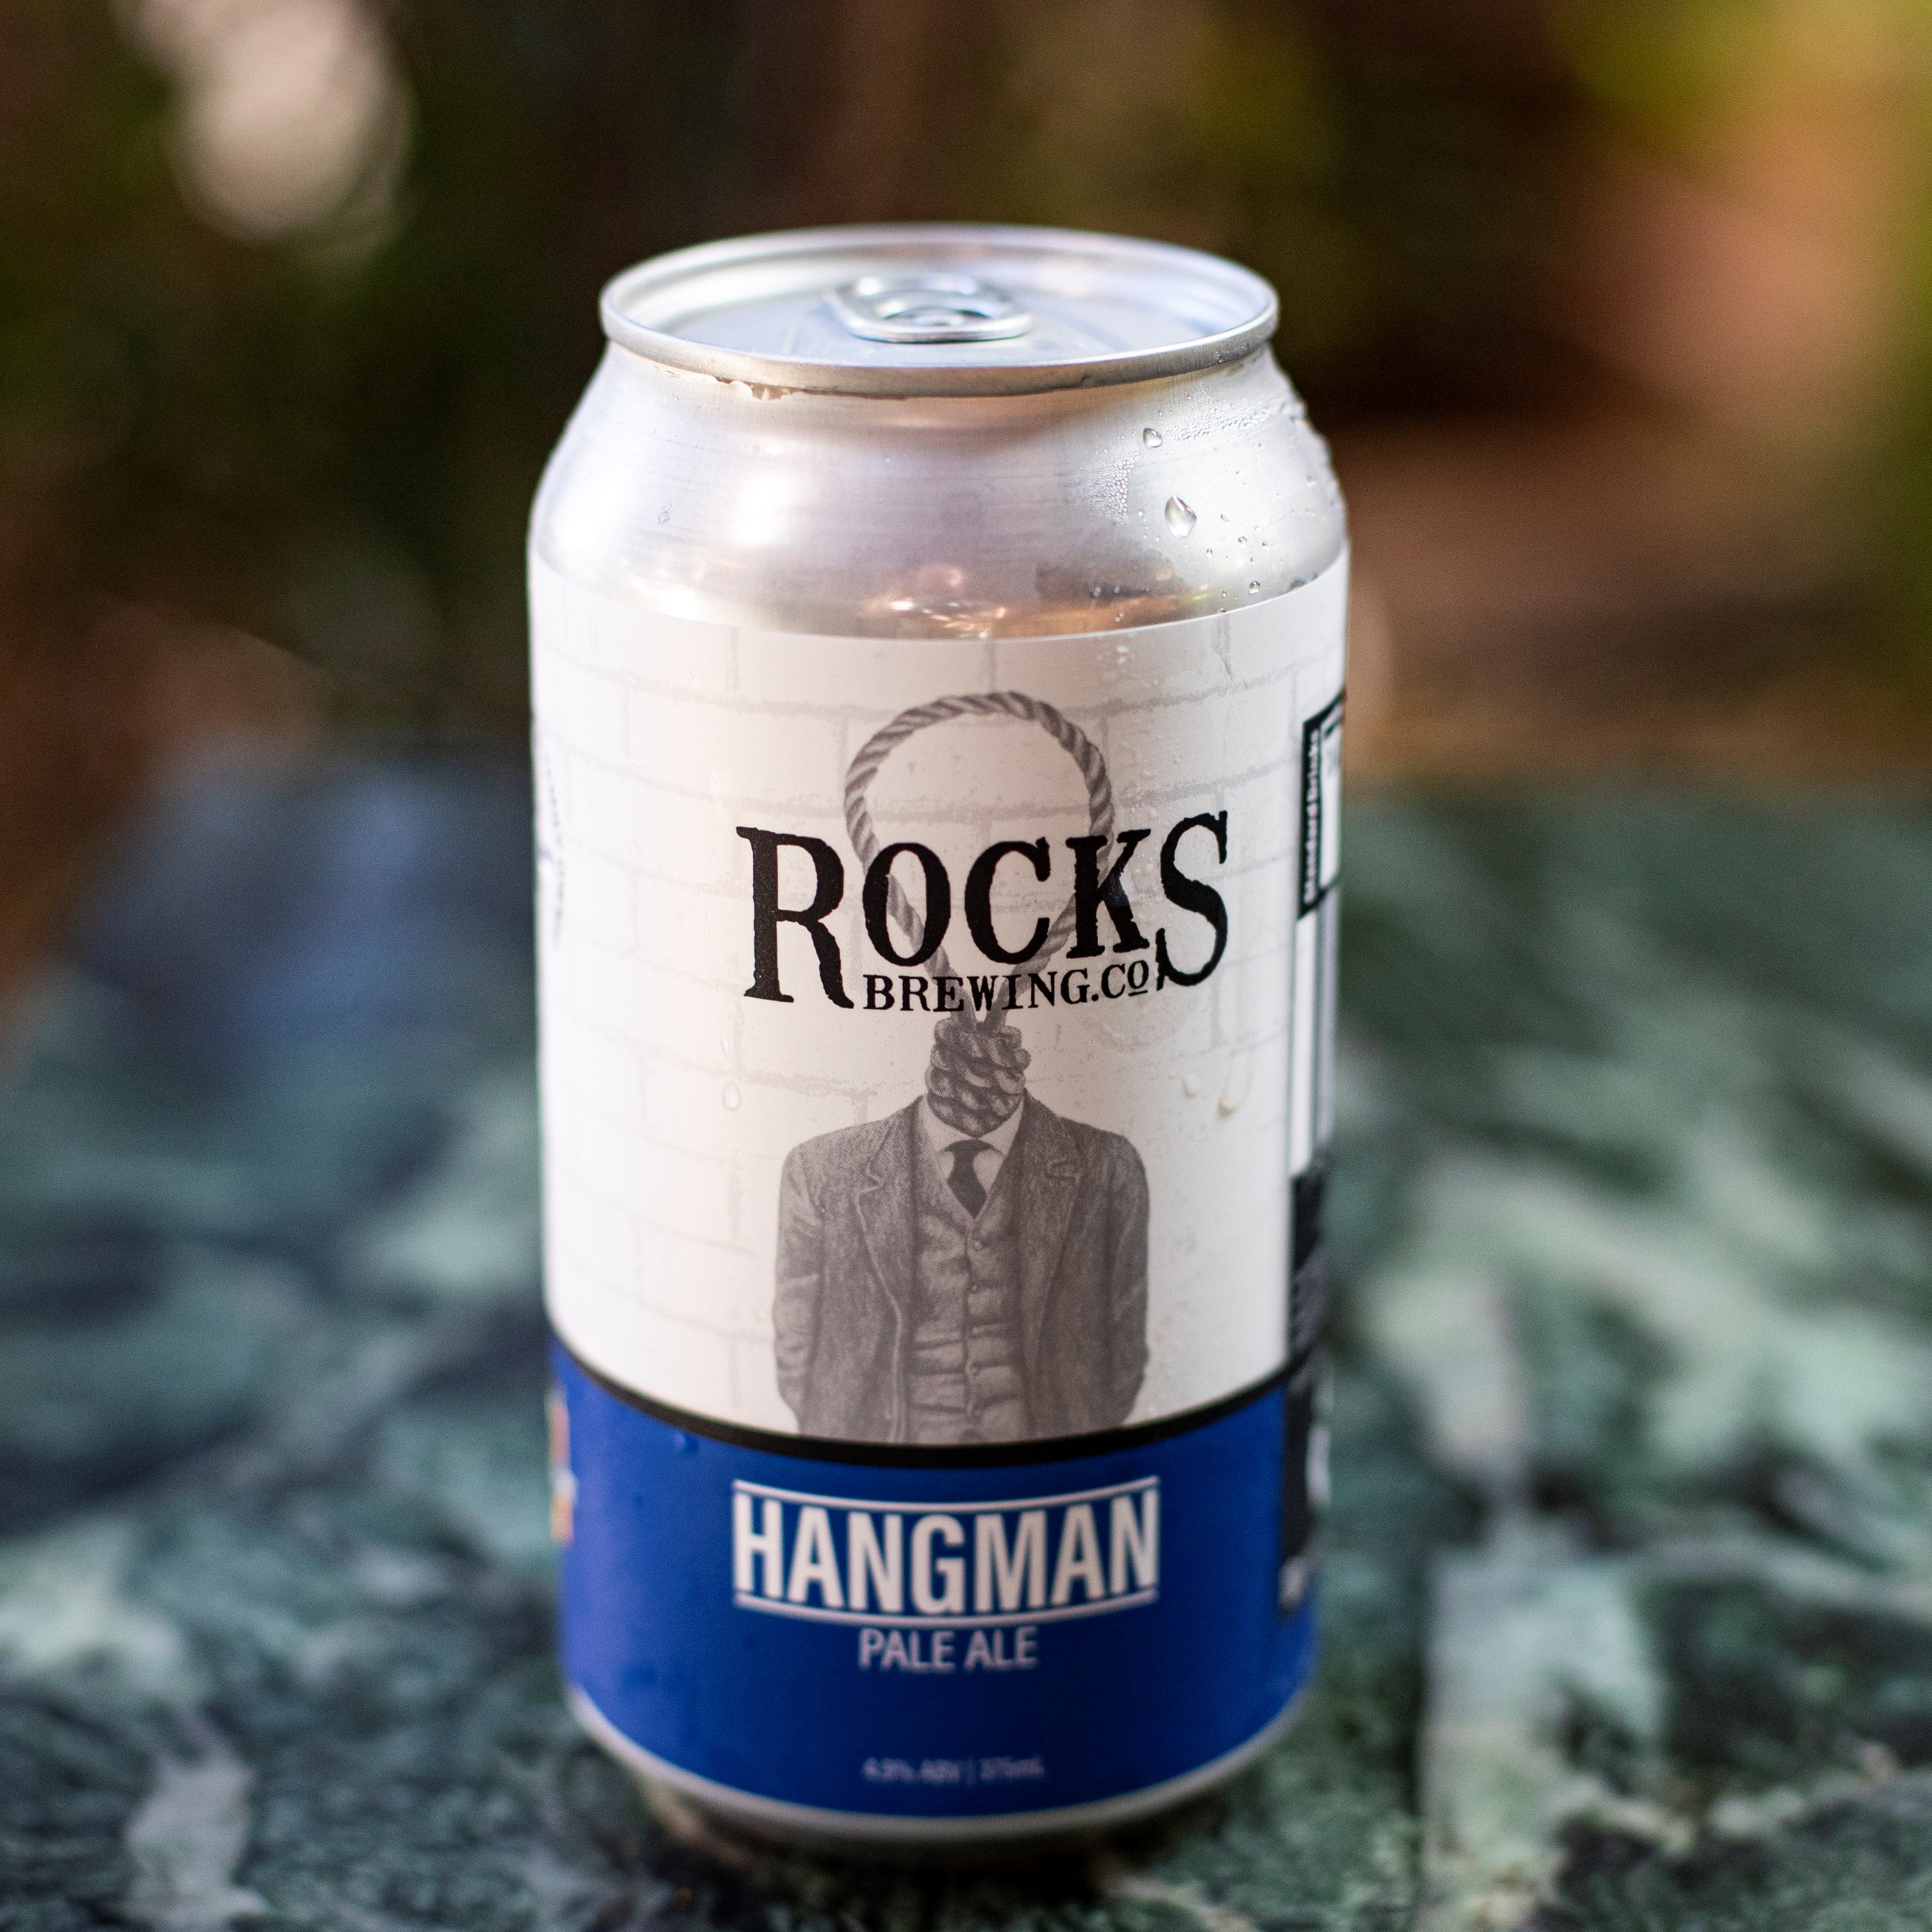 Rocks Brewing Co. Hangman Pale Ale - 6 pack